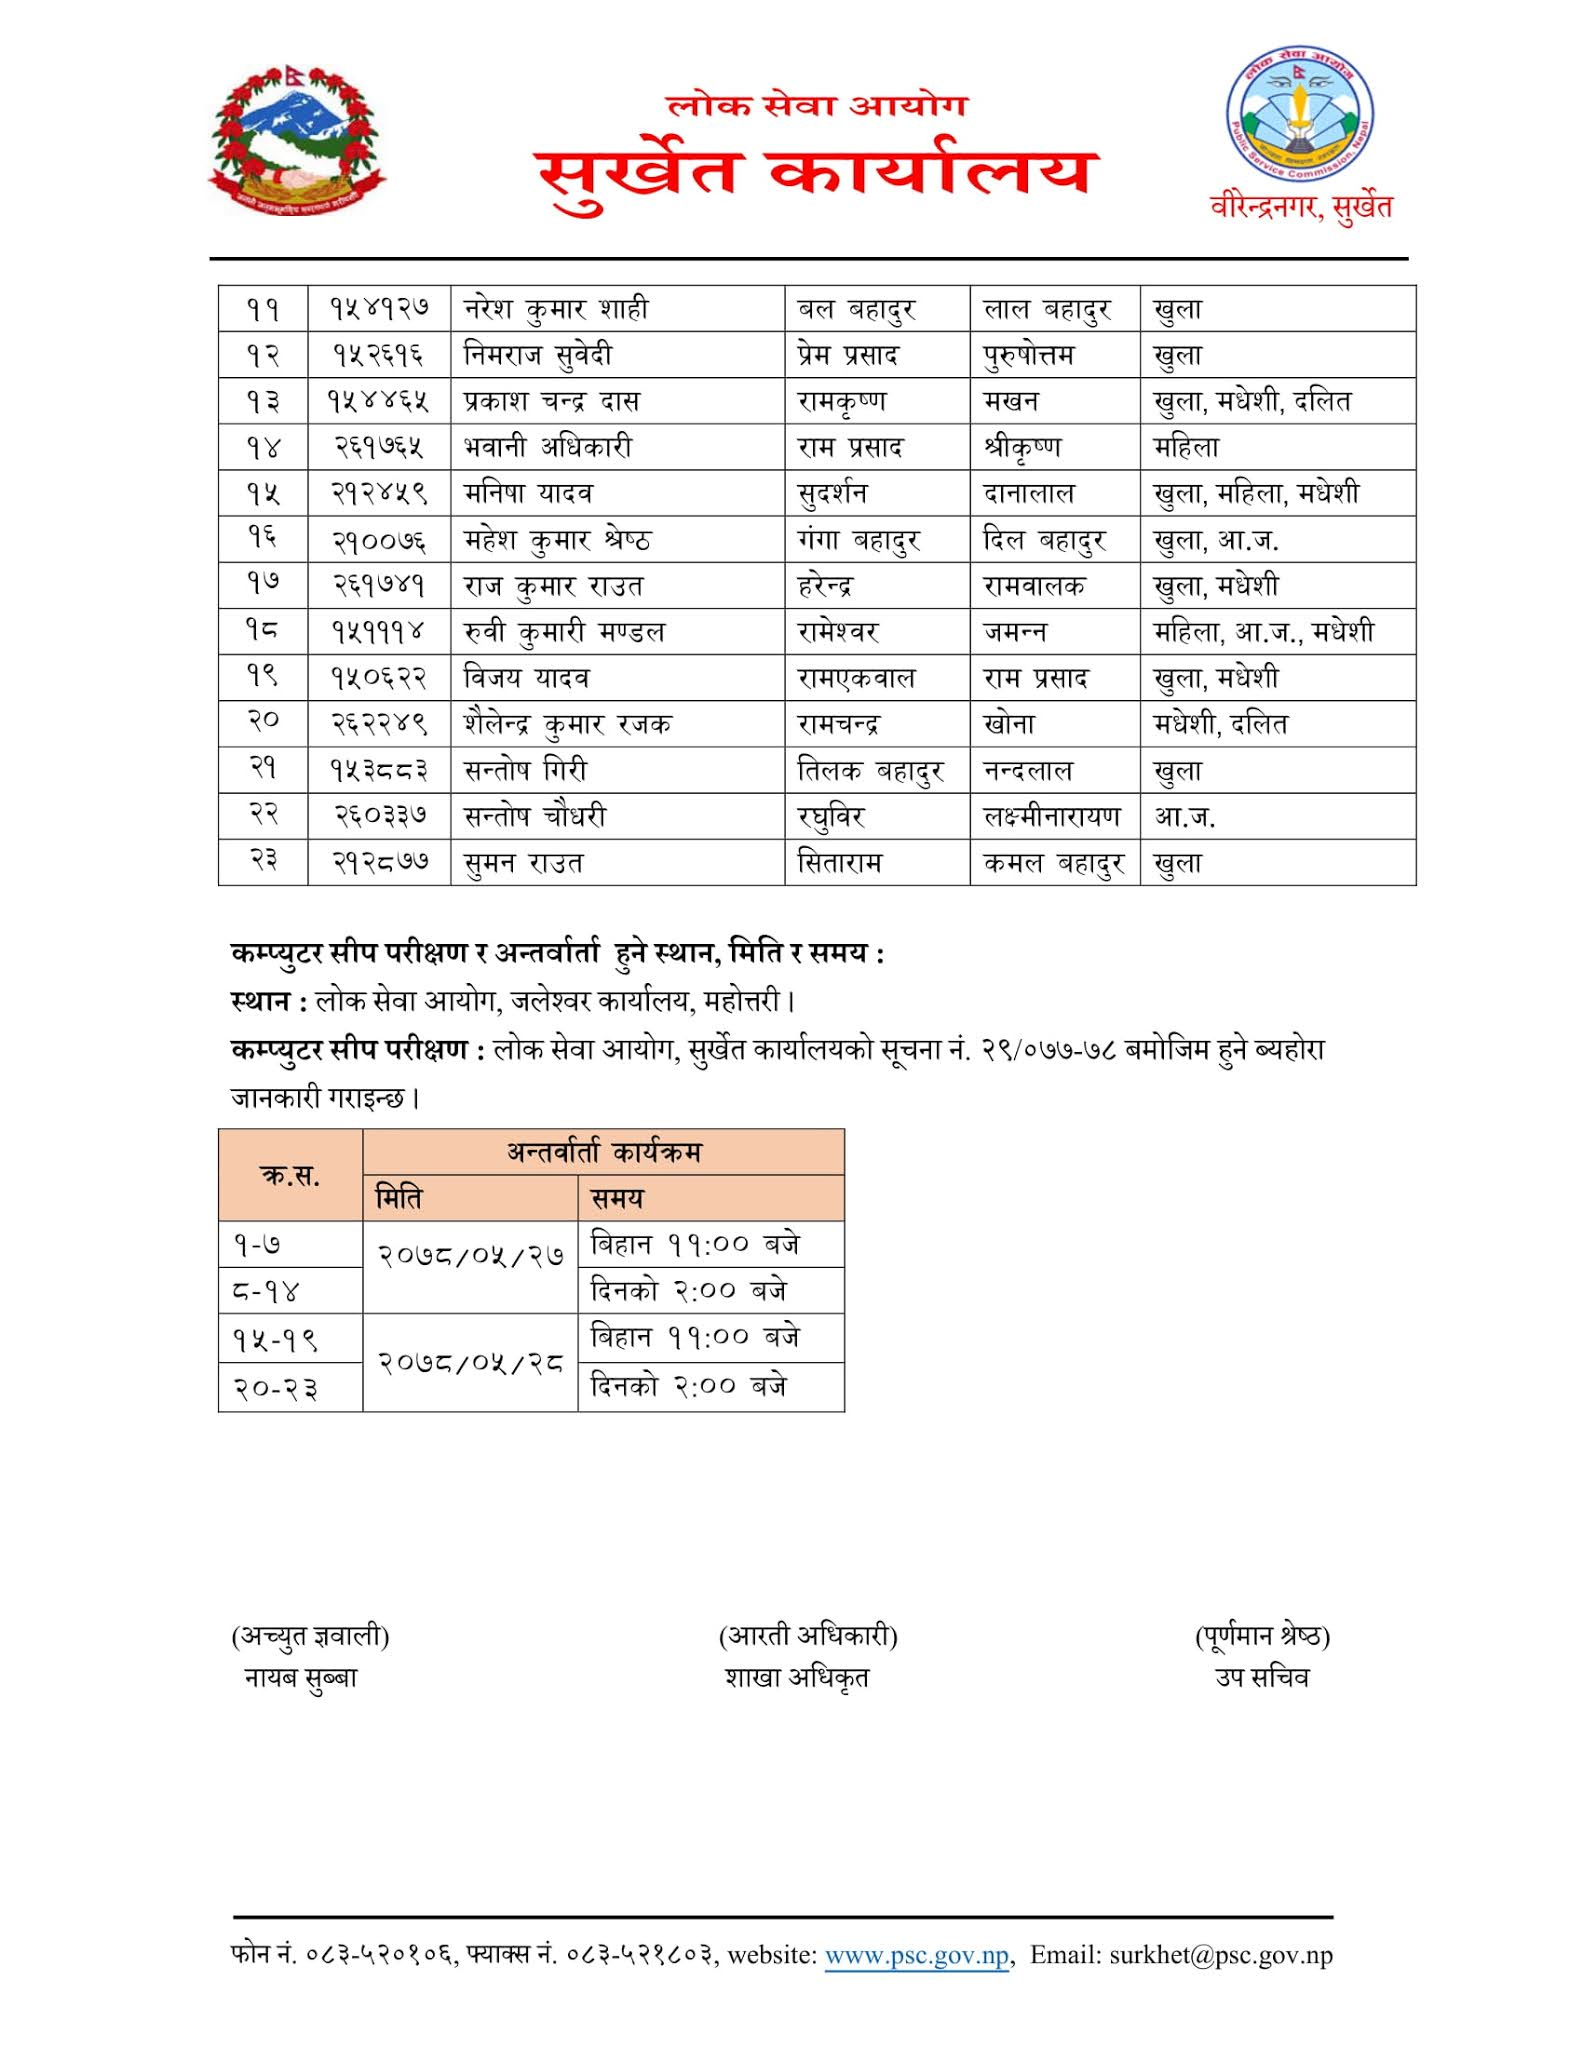 NASU Account - Jaleshwor Lok Sewa Aayog Written Exam Result & Exam Schedule